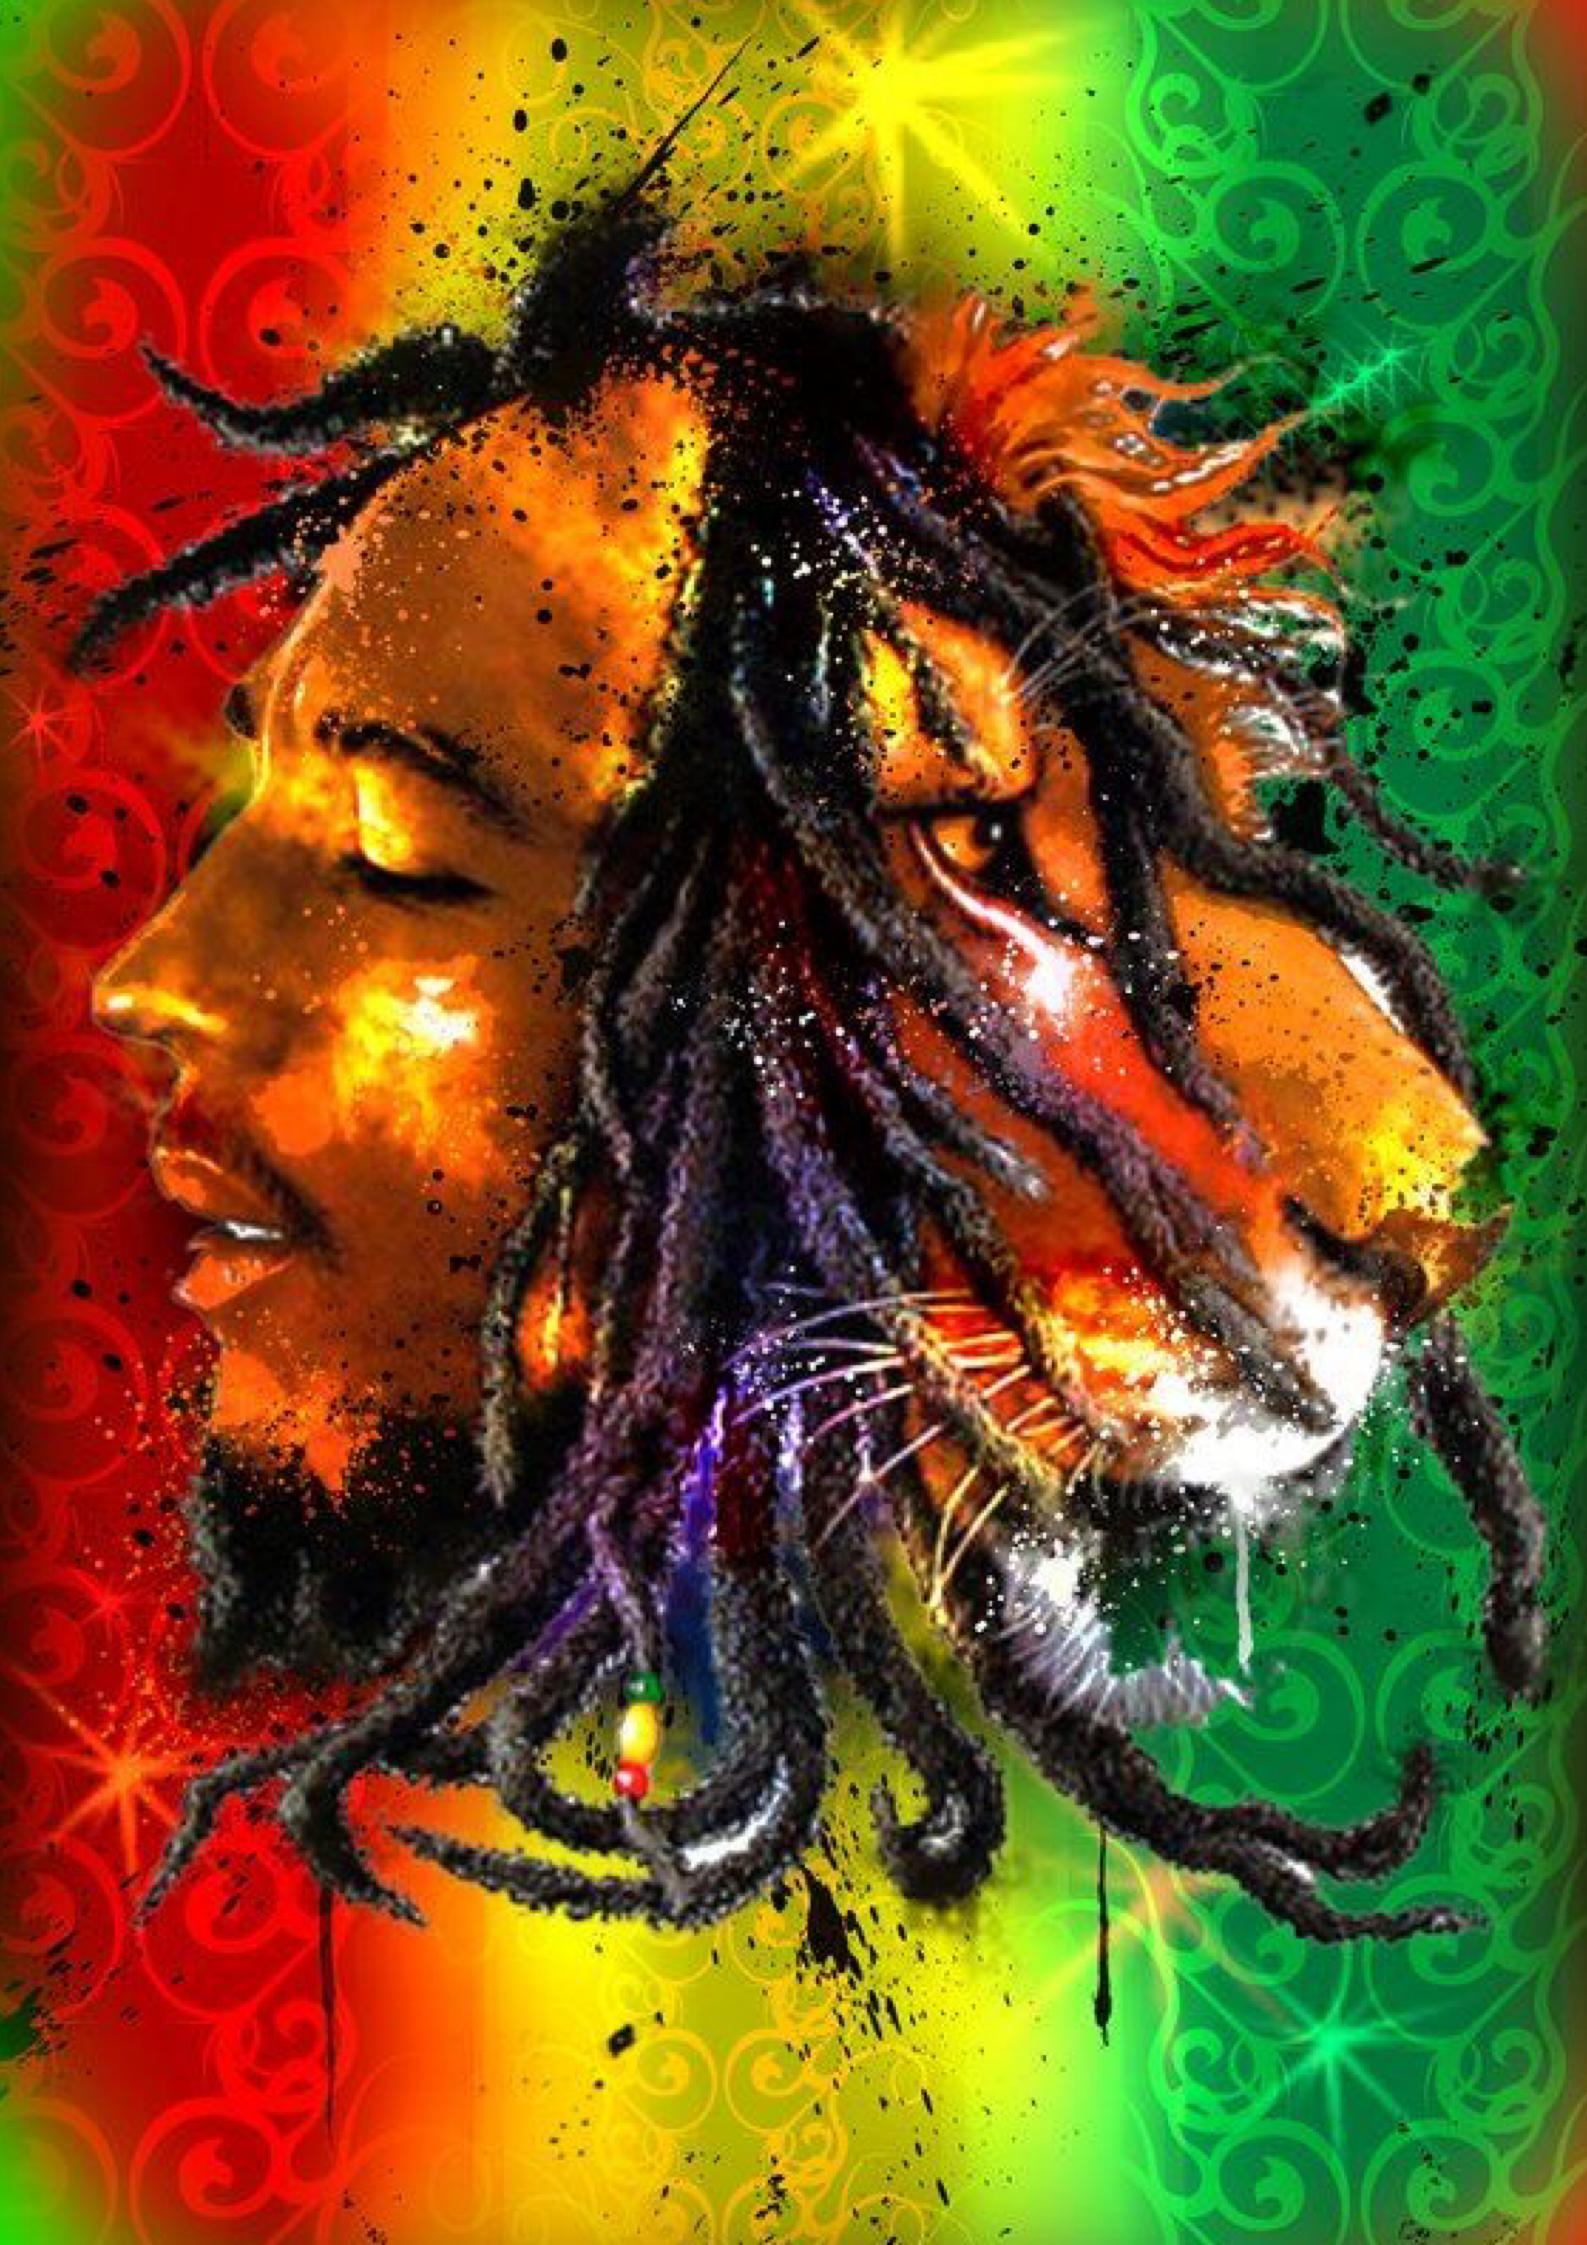 Pin By Cajon Indonesia On Wallpaper A3 Hd And Custom Bob Marley Art Reggae Art Bob Marley Pictures